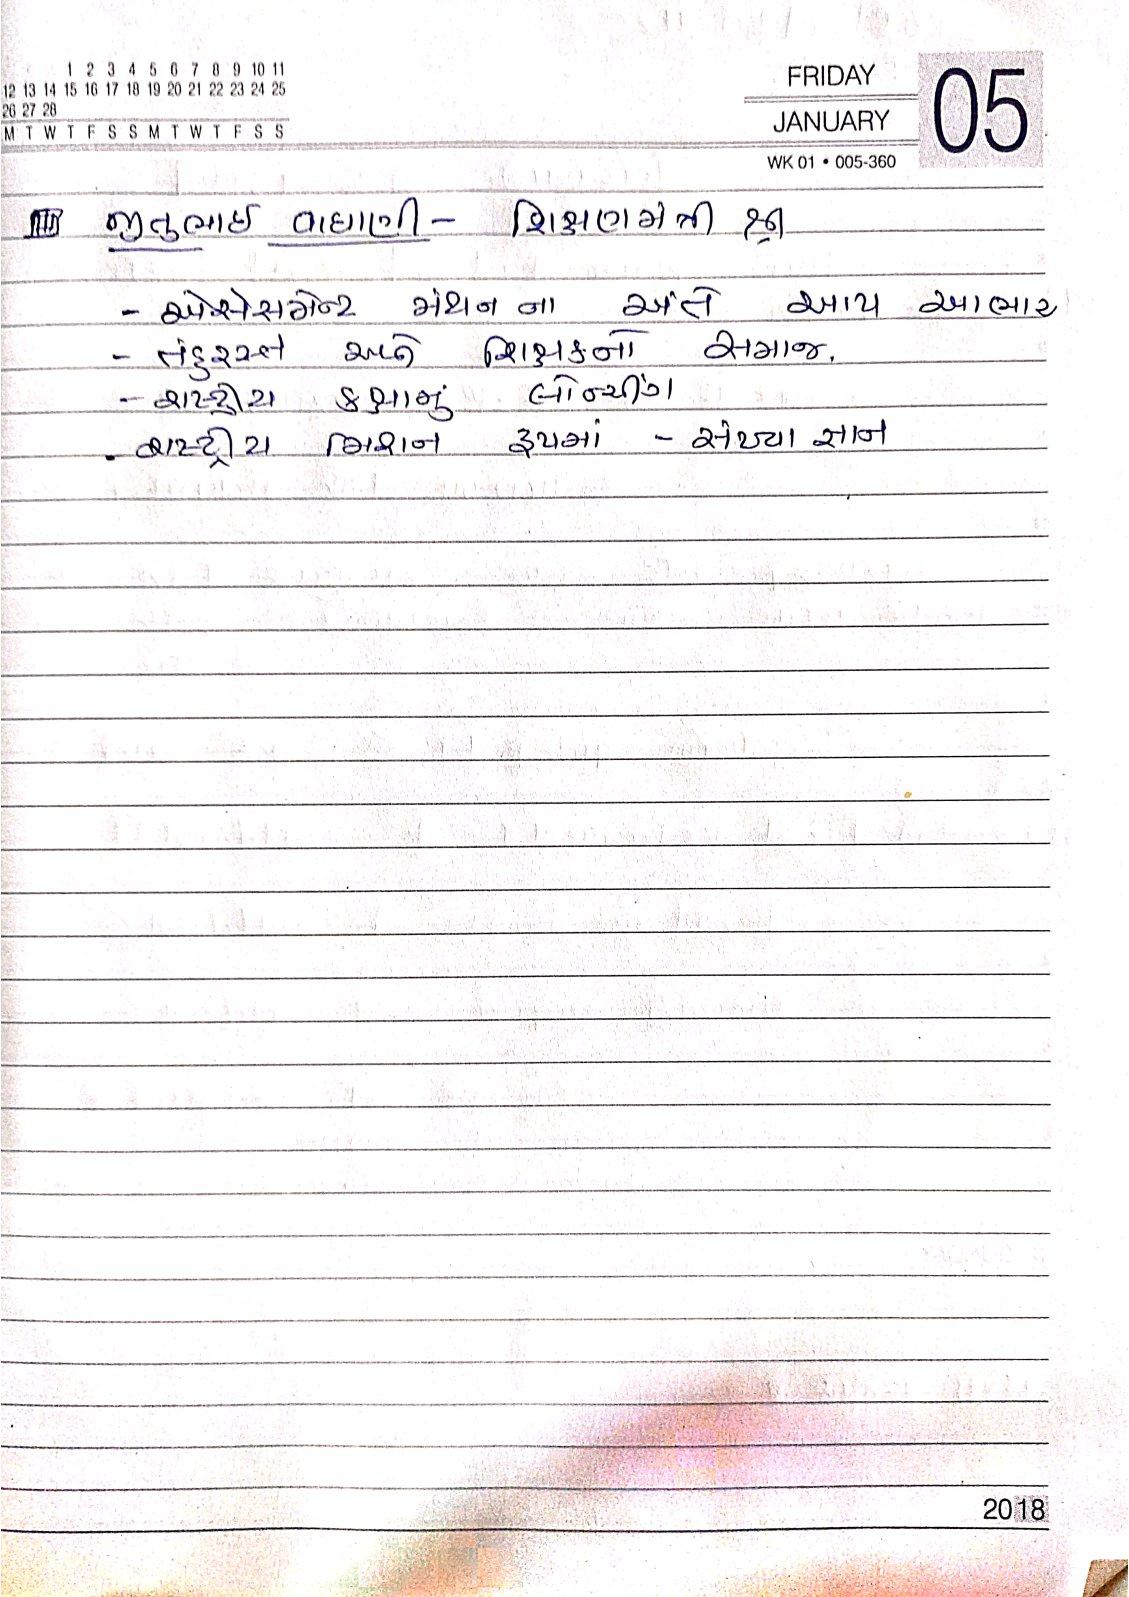 http://www.pravinvankar.in/2021/10/letter-to-watch-teleconference-on-1-10.html